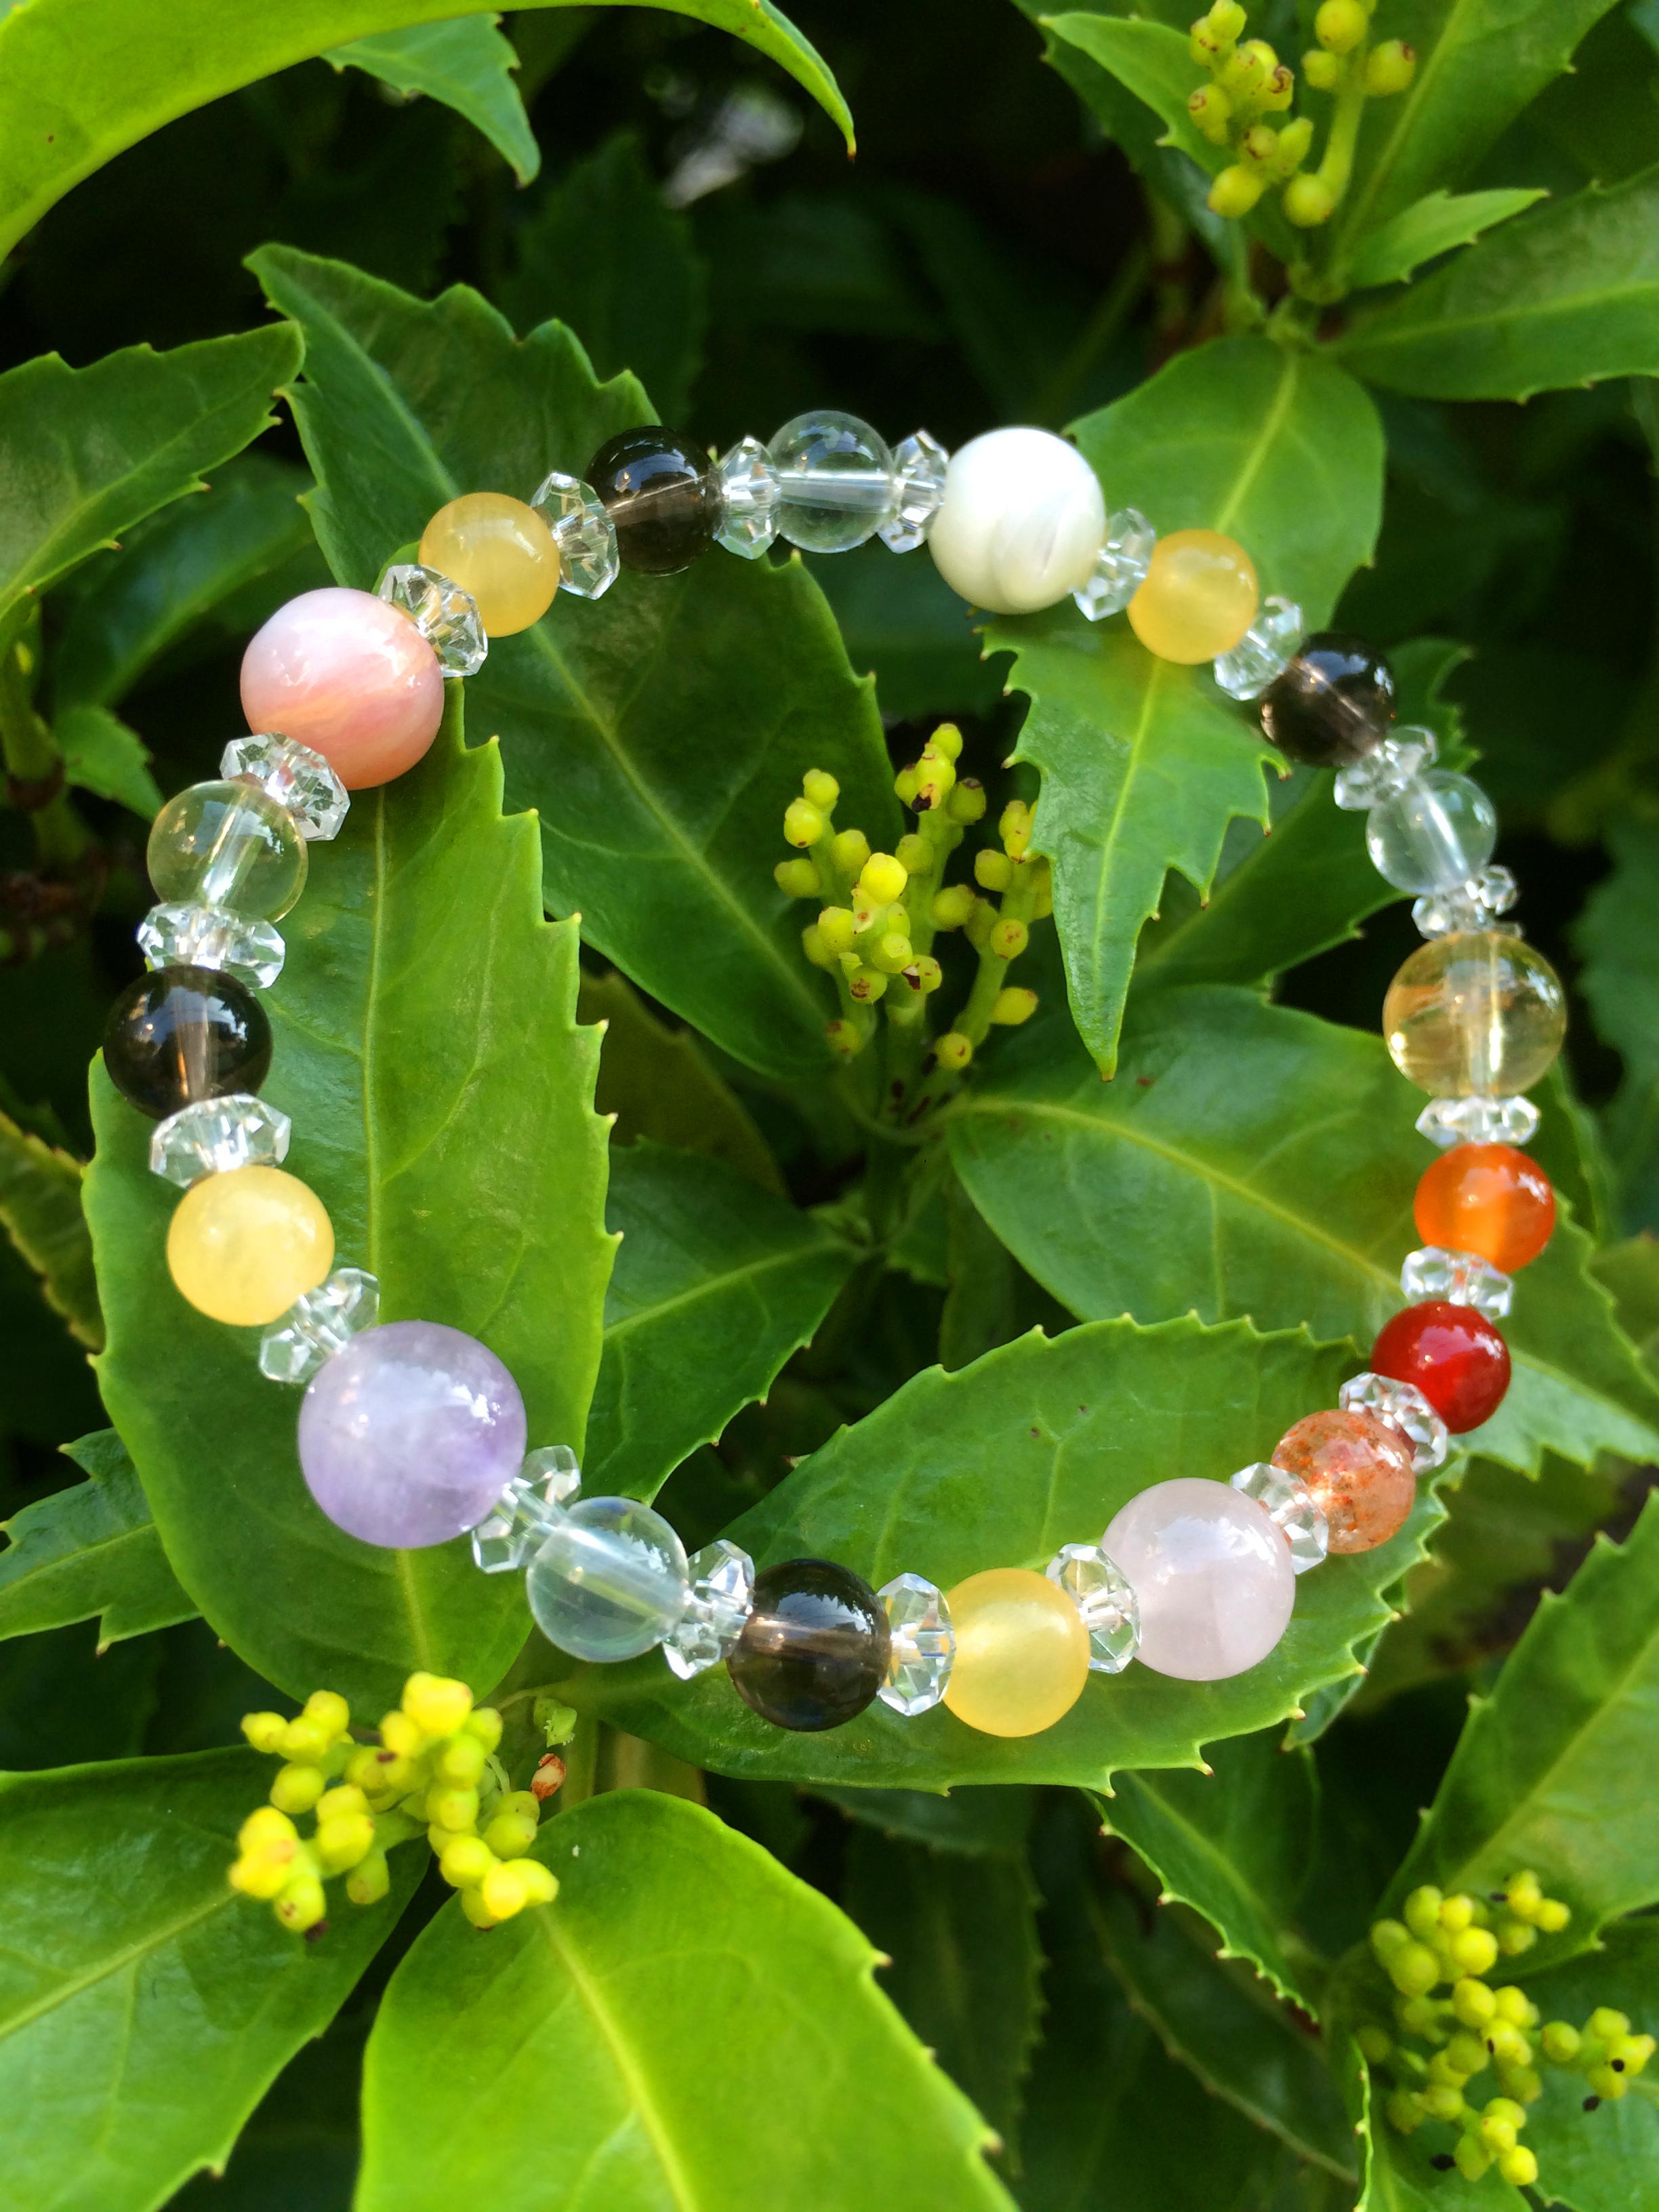 Amaterasu 天照大神 gemstone bracelet